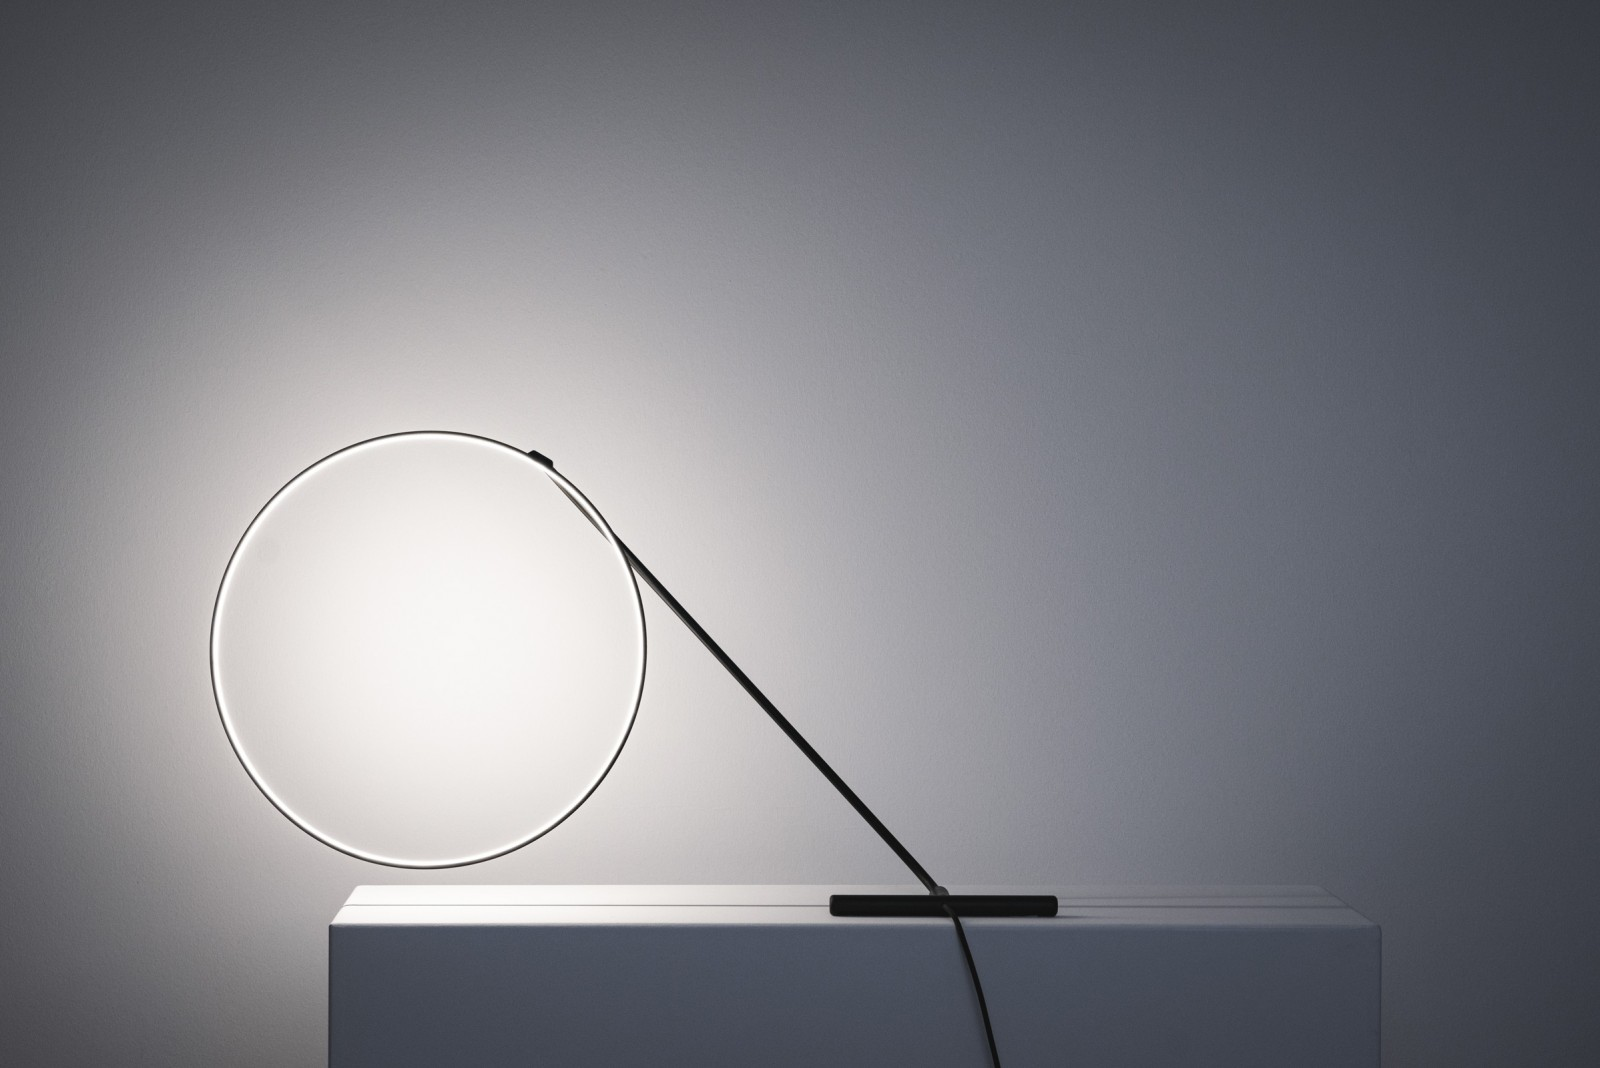 award winning design poise adjustable table lamp design by dabi robert